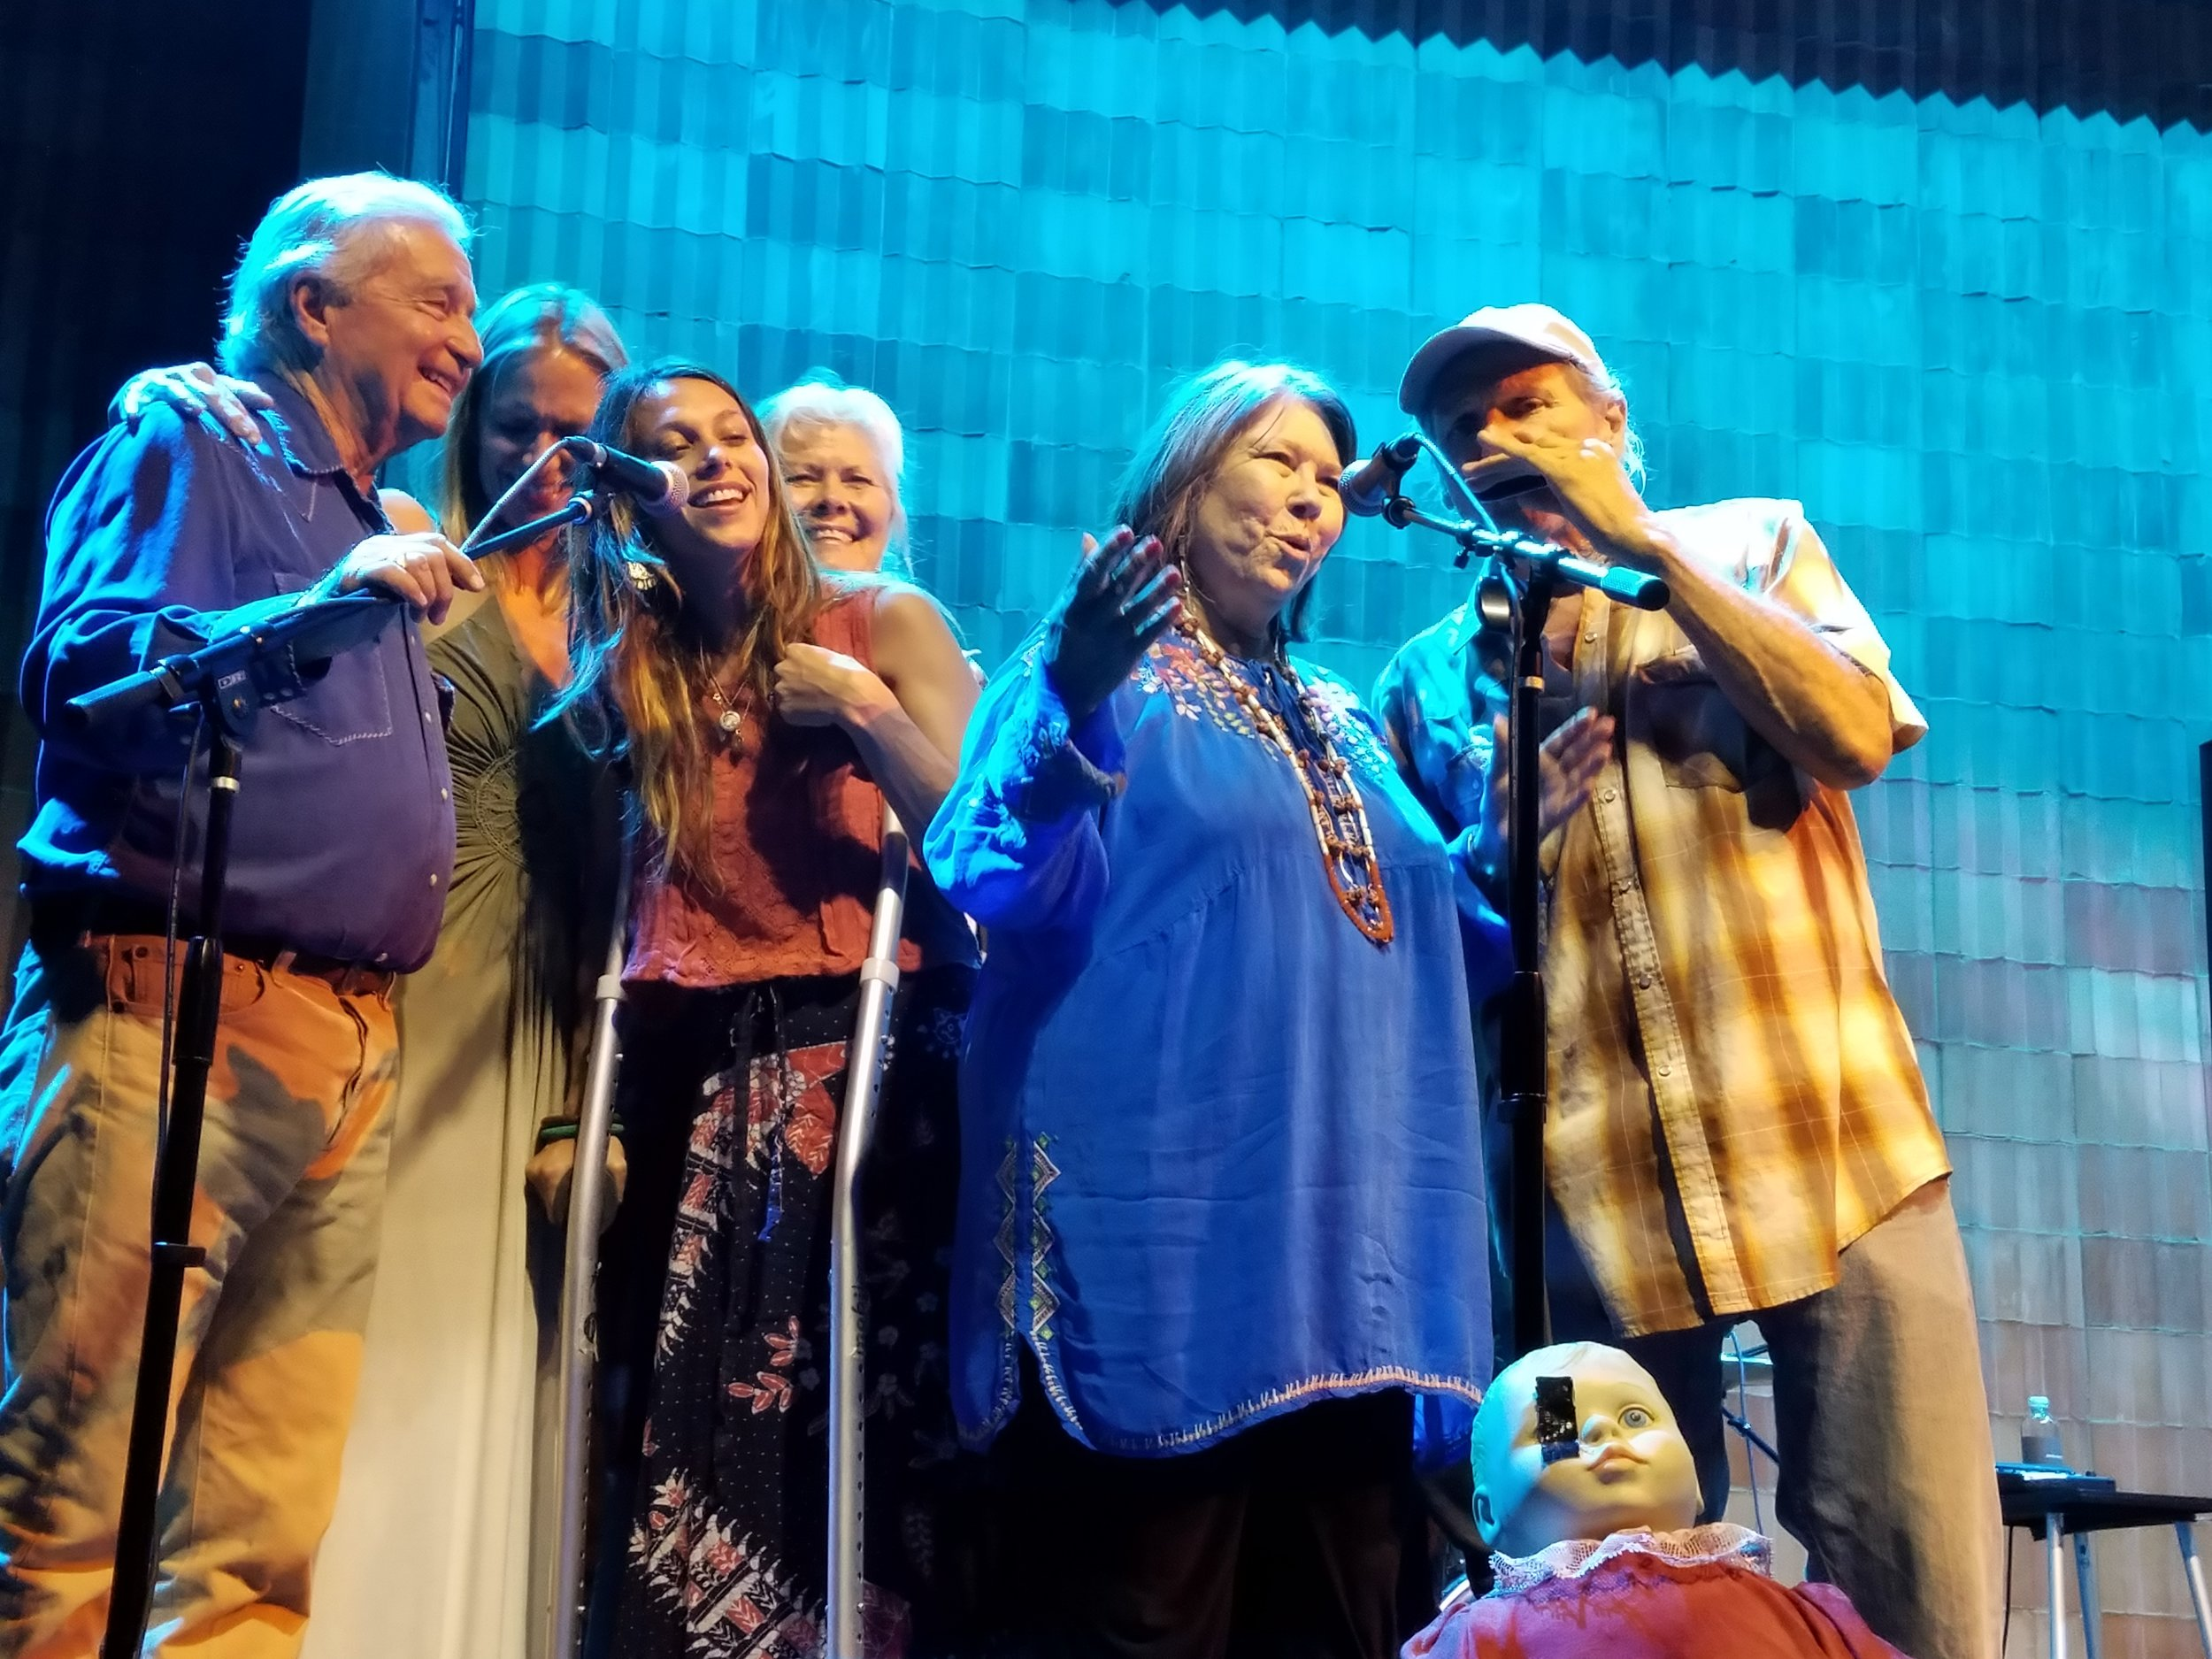 Jo Harvey Allen, center in blue smock at Marfa, Texas concert celebrating her 55th anniversary. Dick DeGuerin on left.